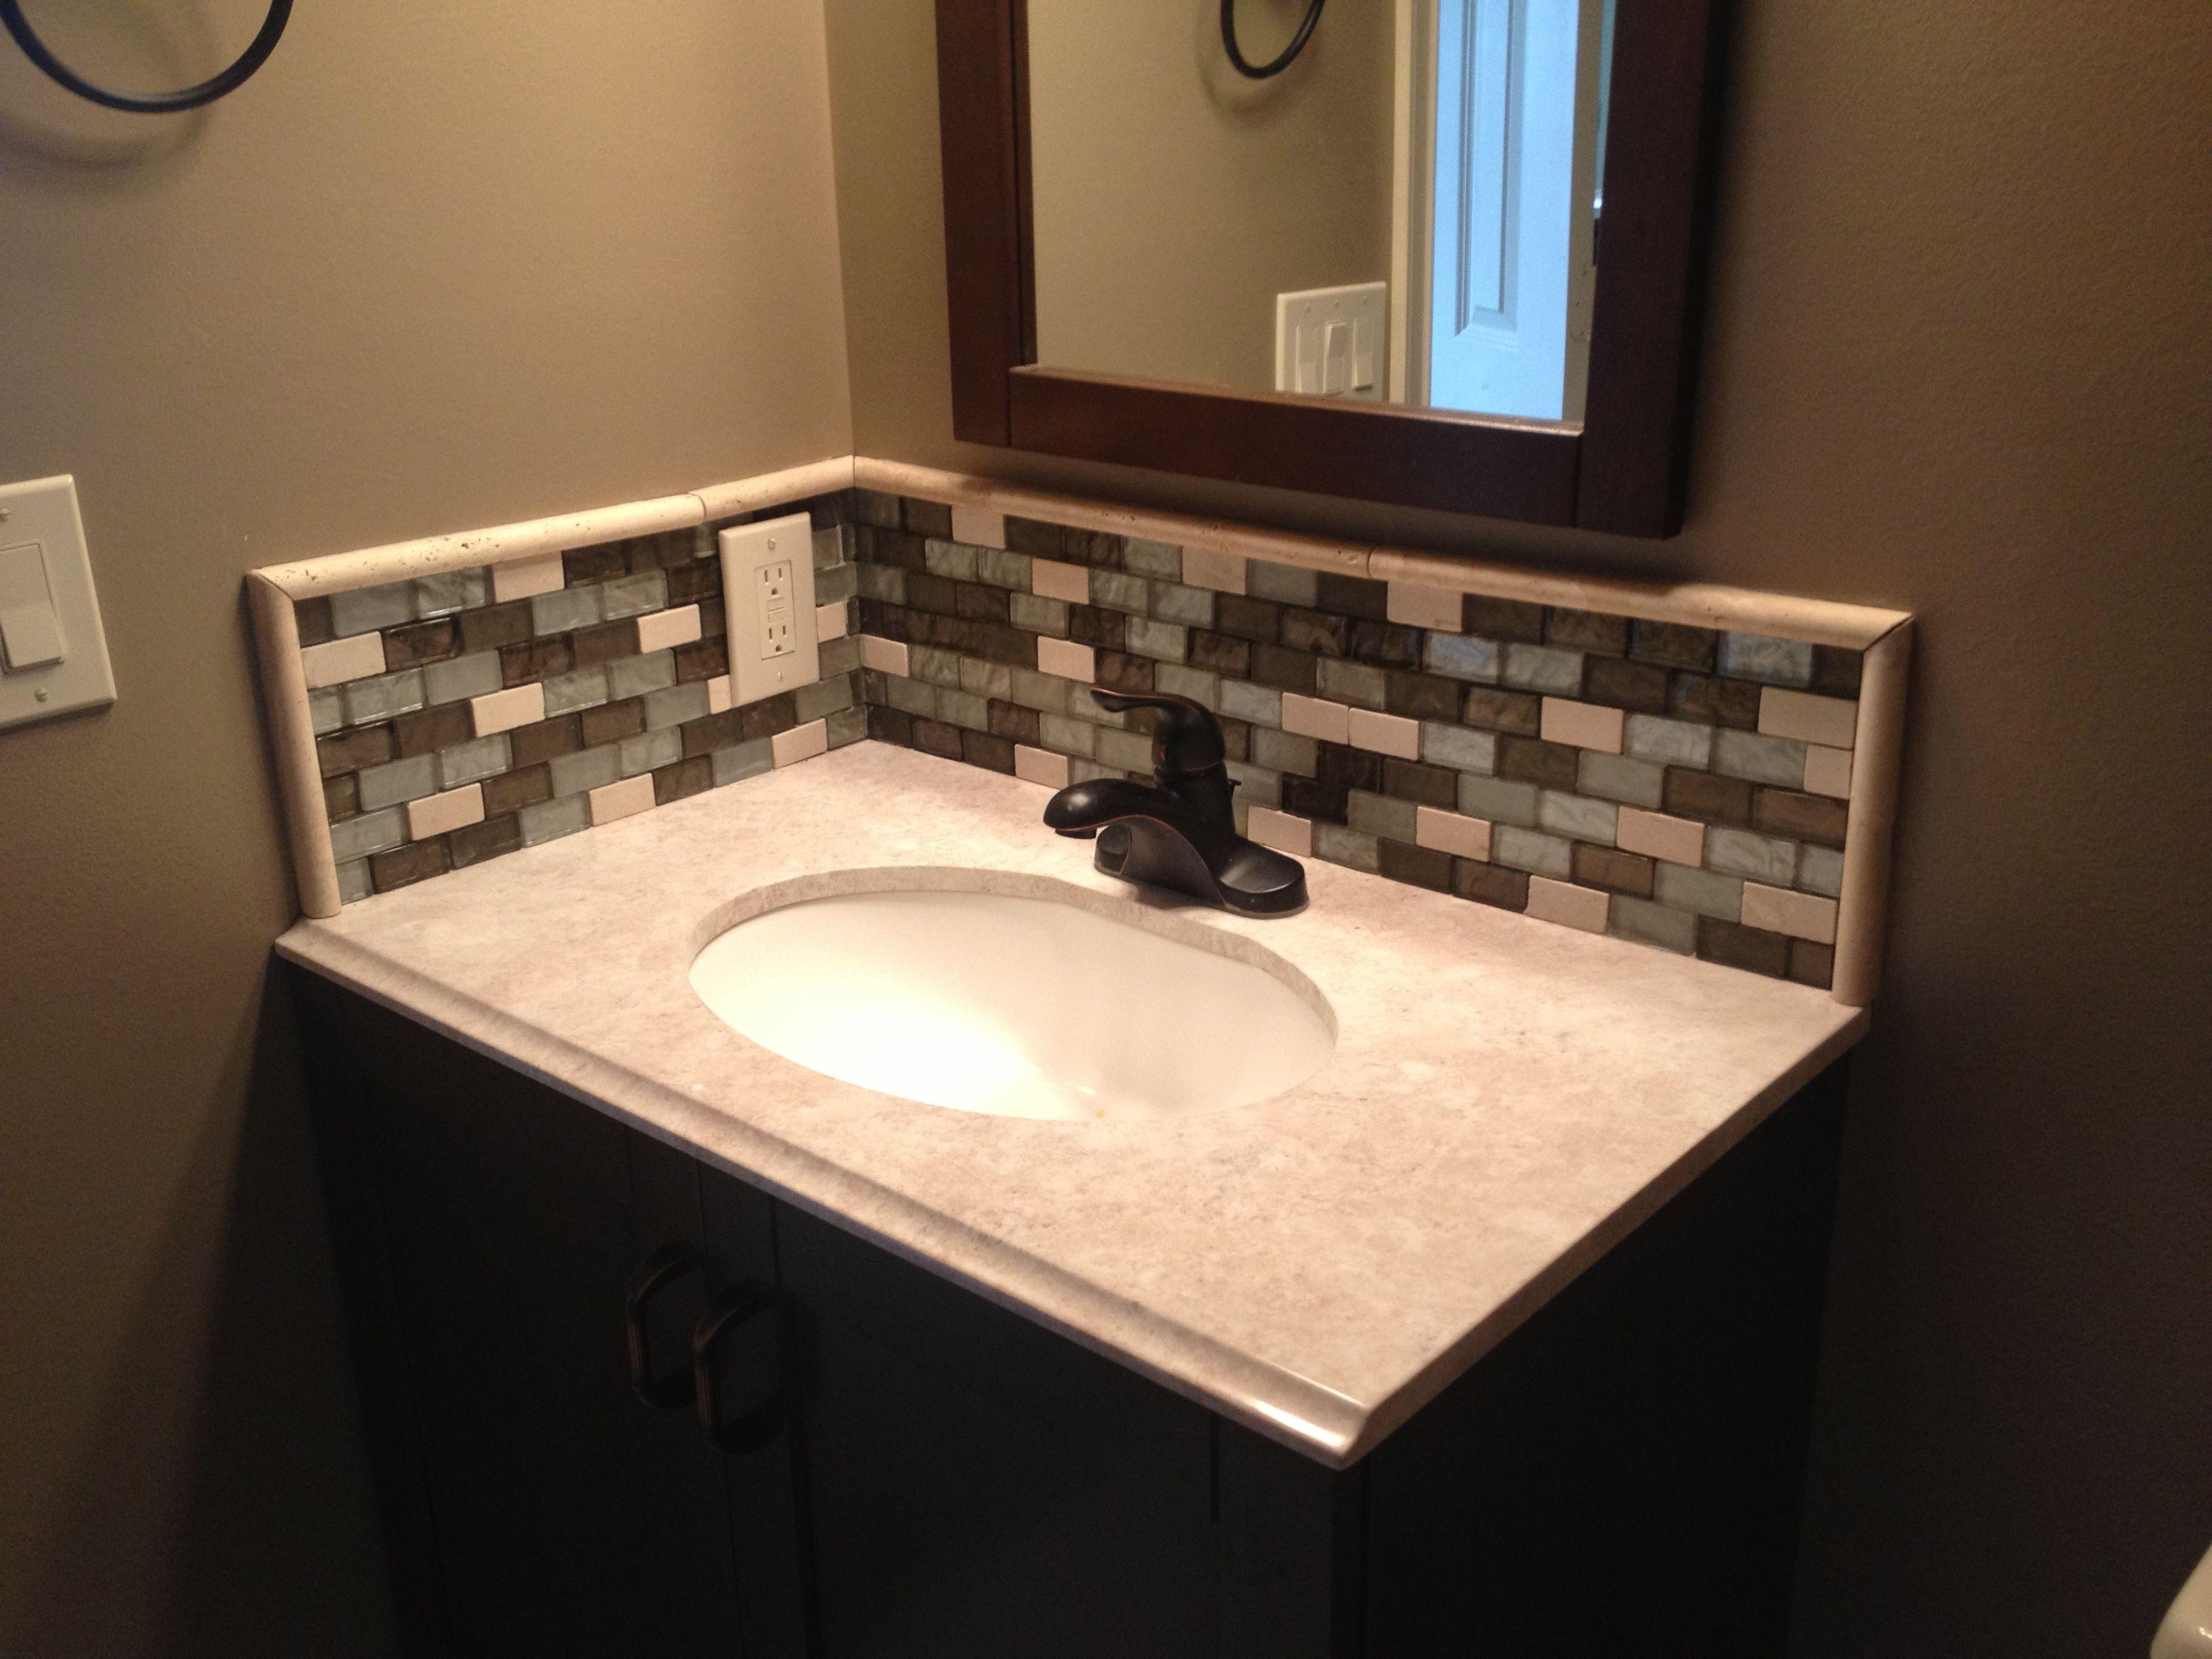 Unique Tile Backsplash With Bullnose Tile And Undermount Sink Also